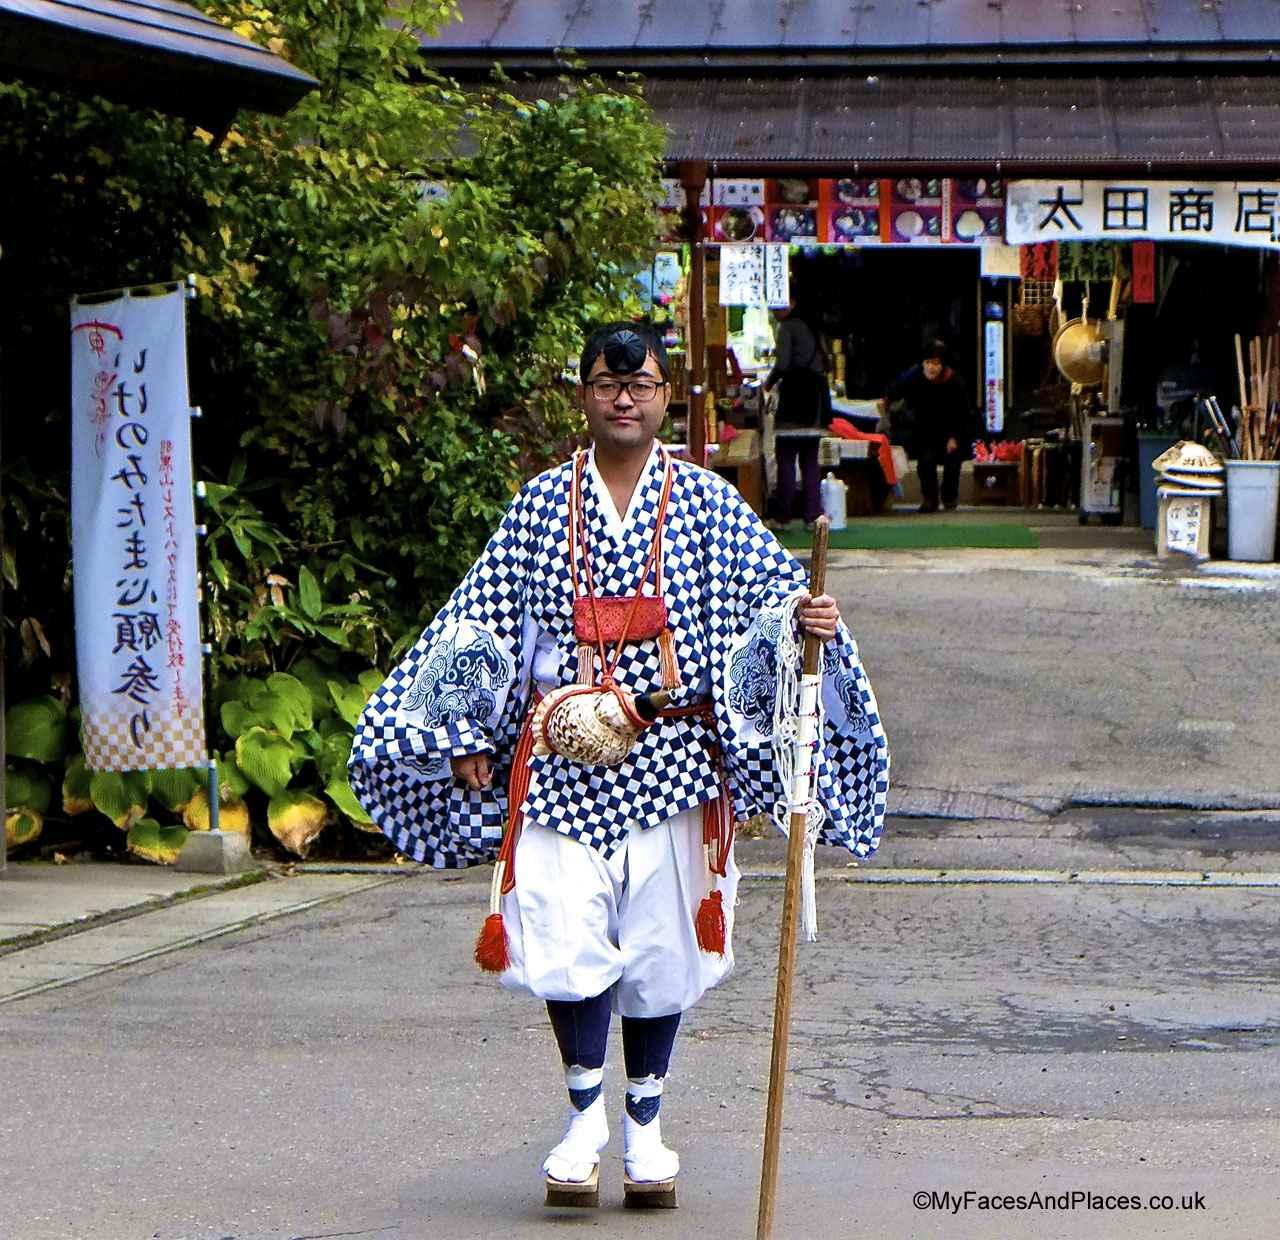 Japan - A yamabushi mountain monk in his full religious regalia